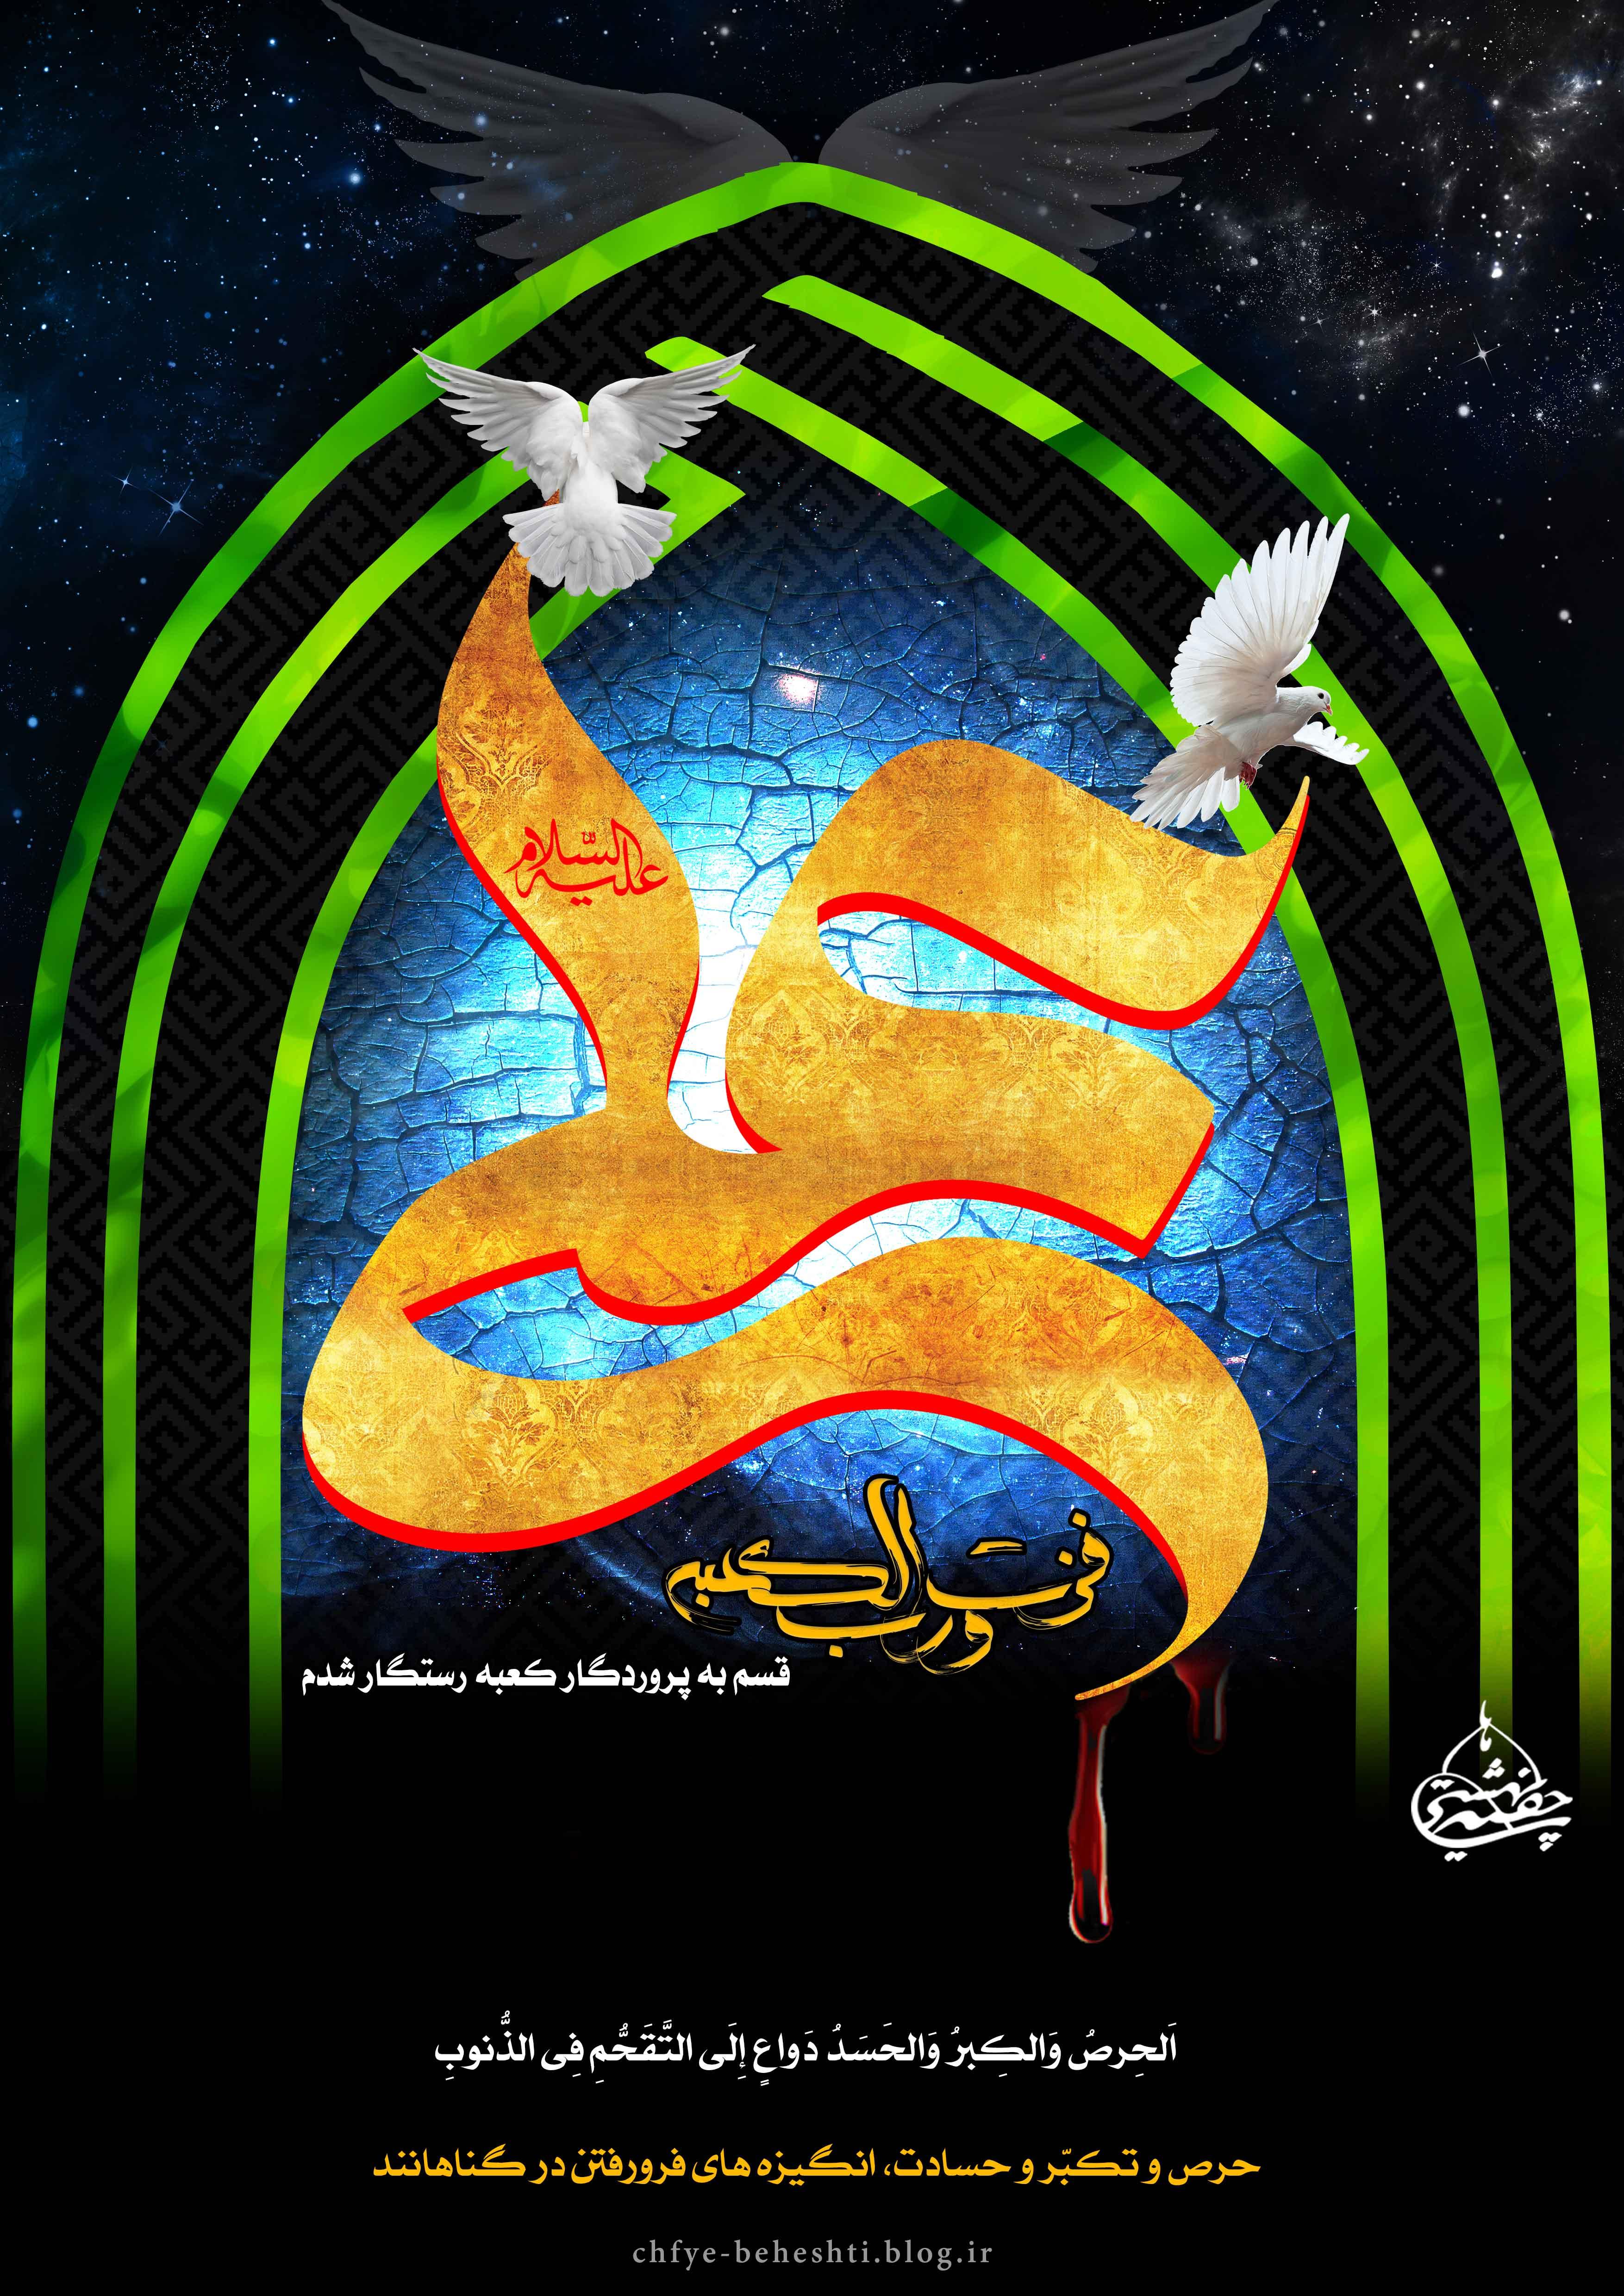 پوستر شهادت امام علی(علیه السلام)